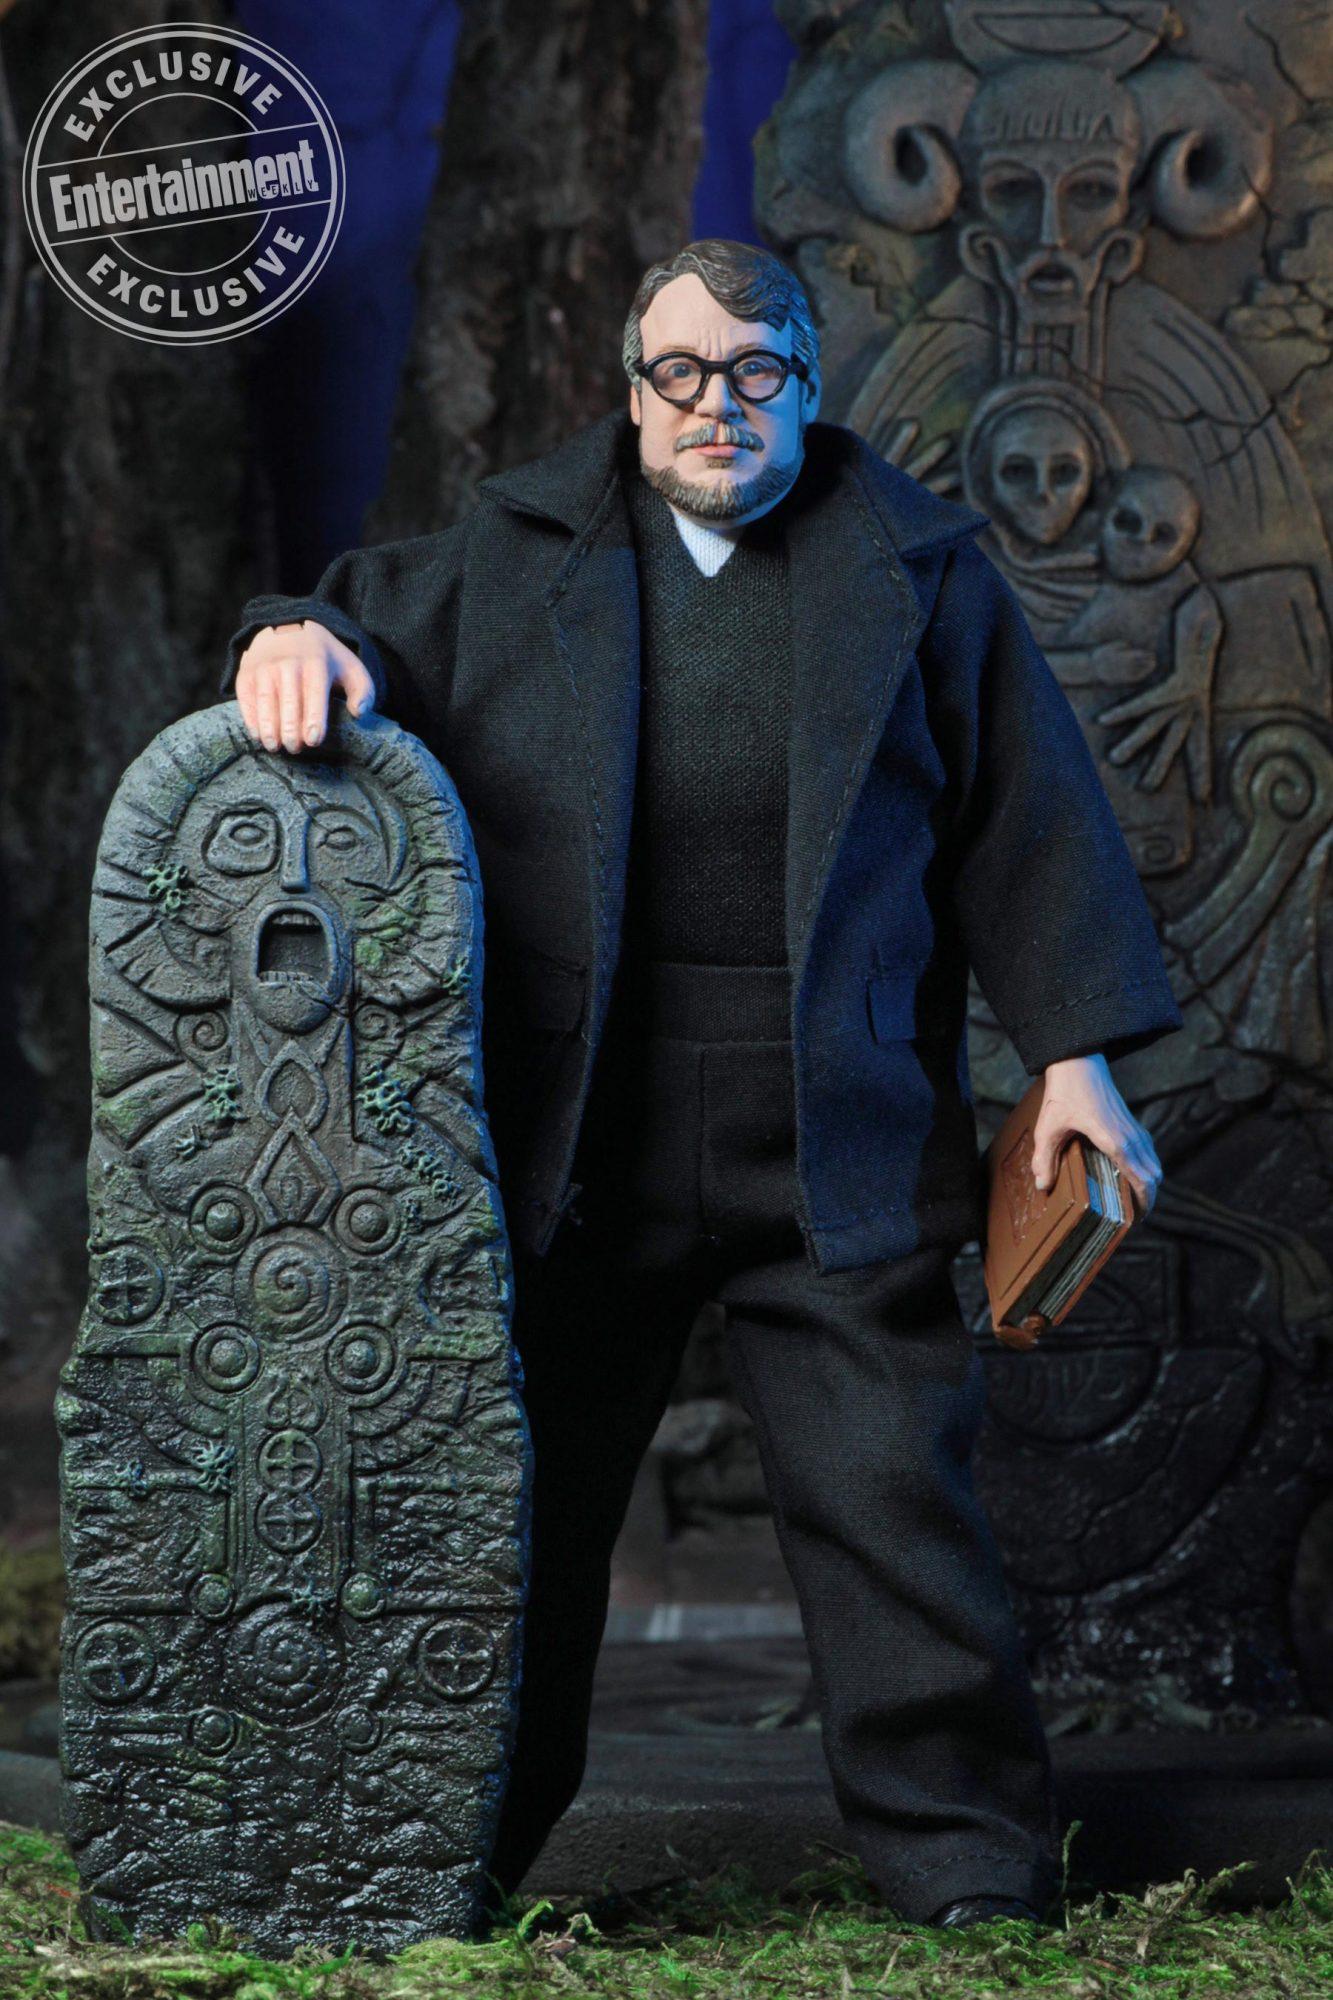 NECA's Guillermo del Toro action figures